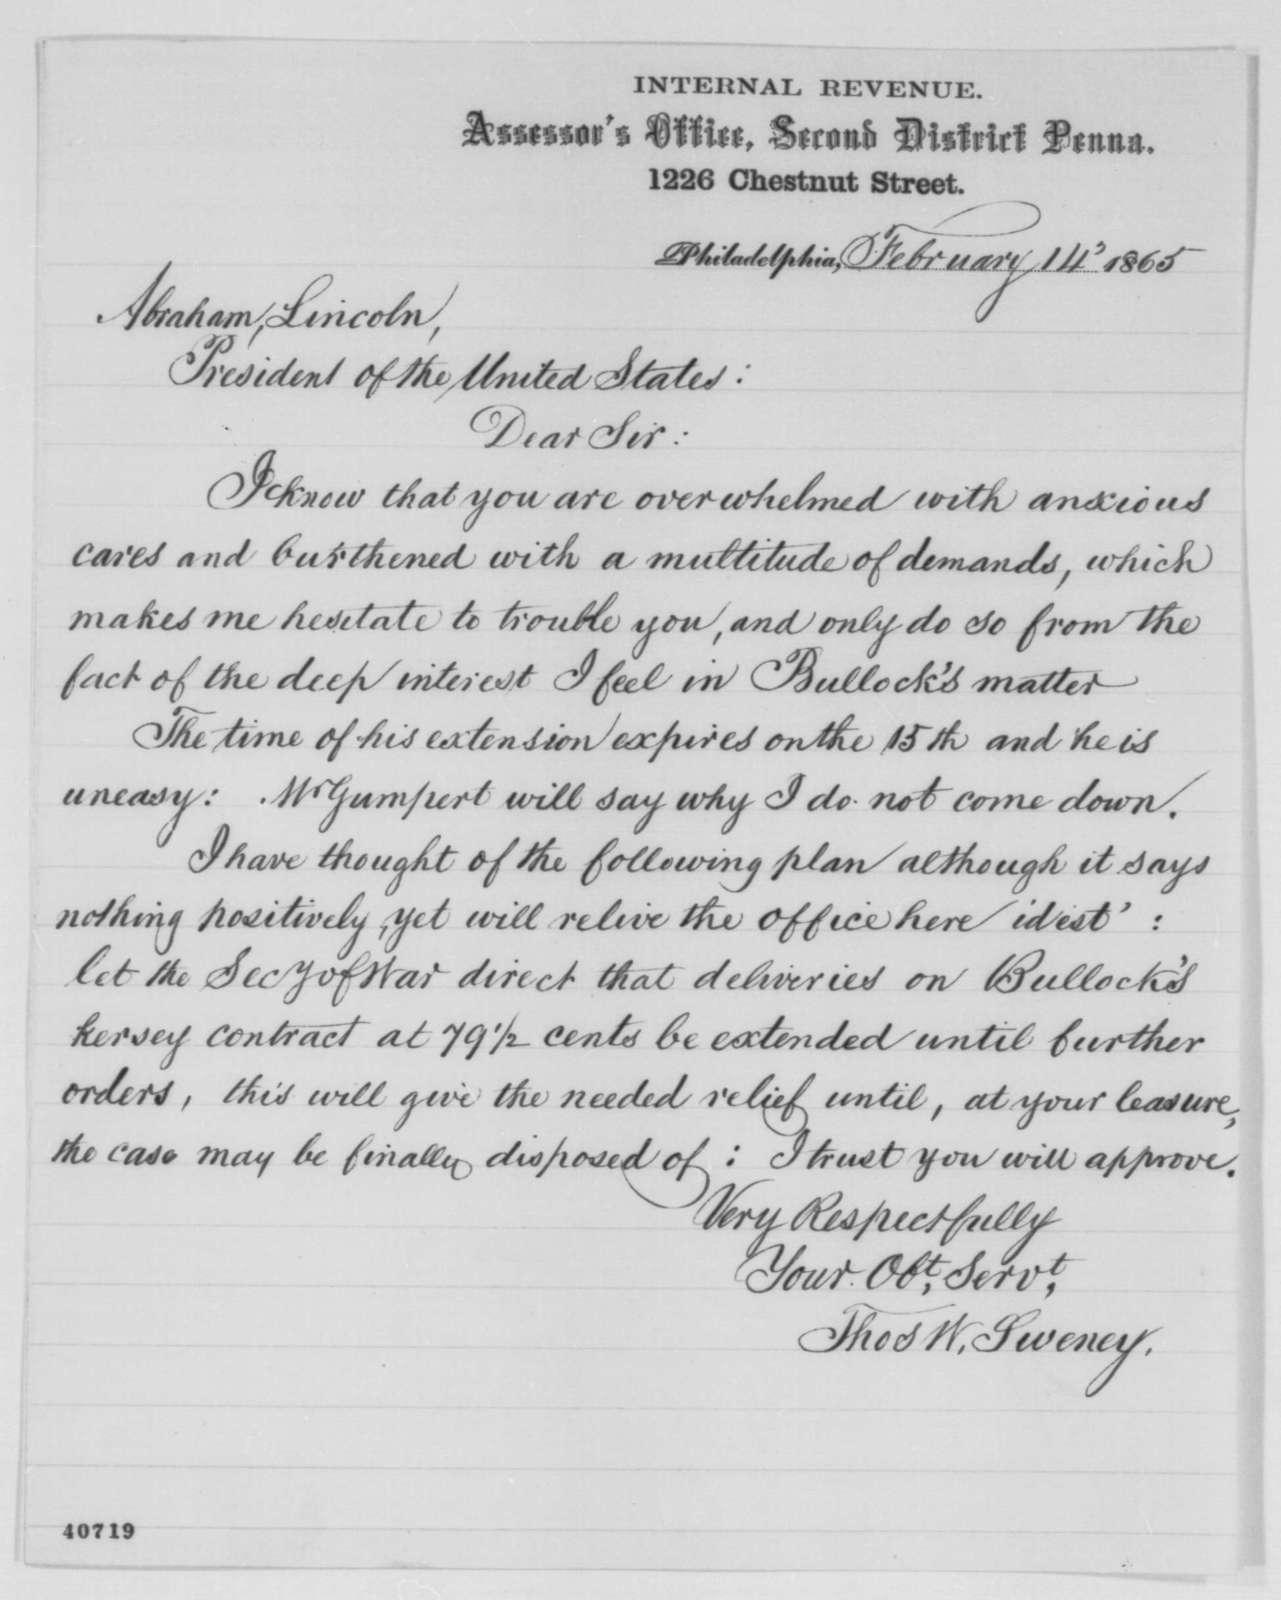 Thomas W. Sweney to Abraham Lincoln, Tuesday, February 14, 1865  (Bullock's case)